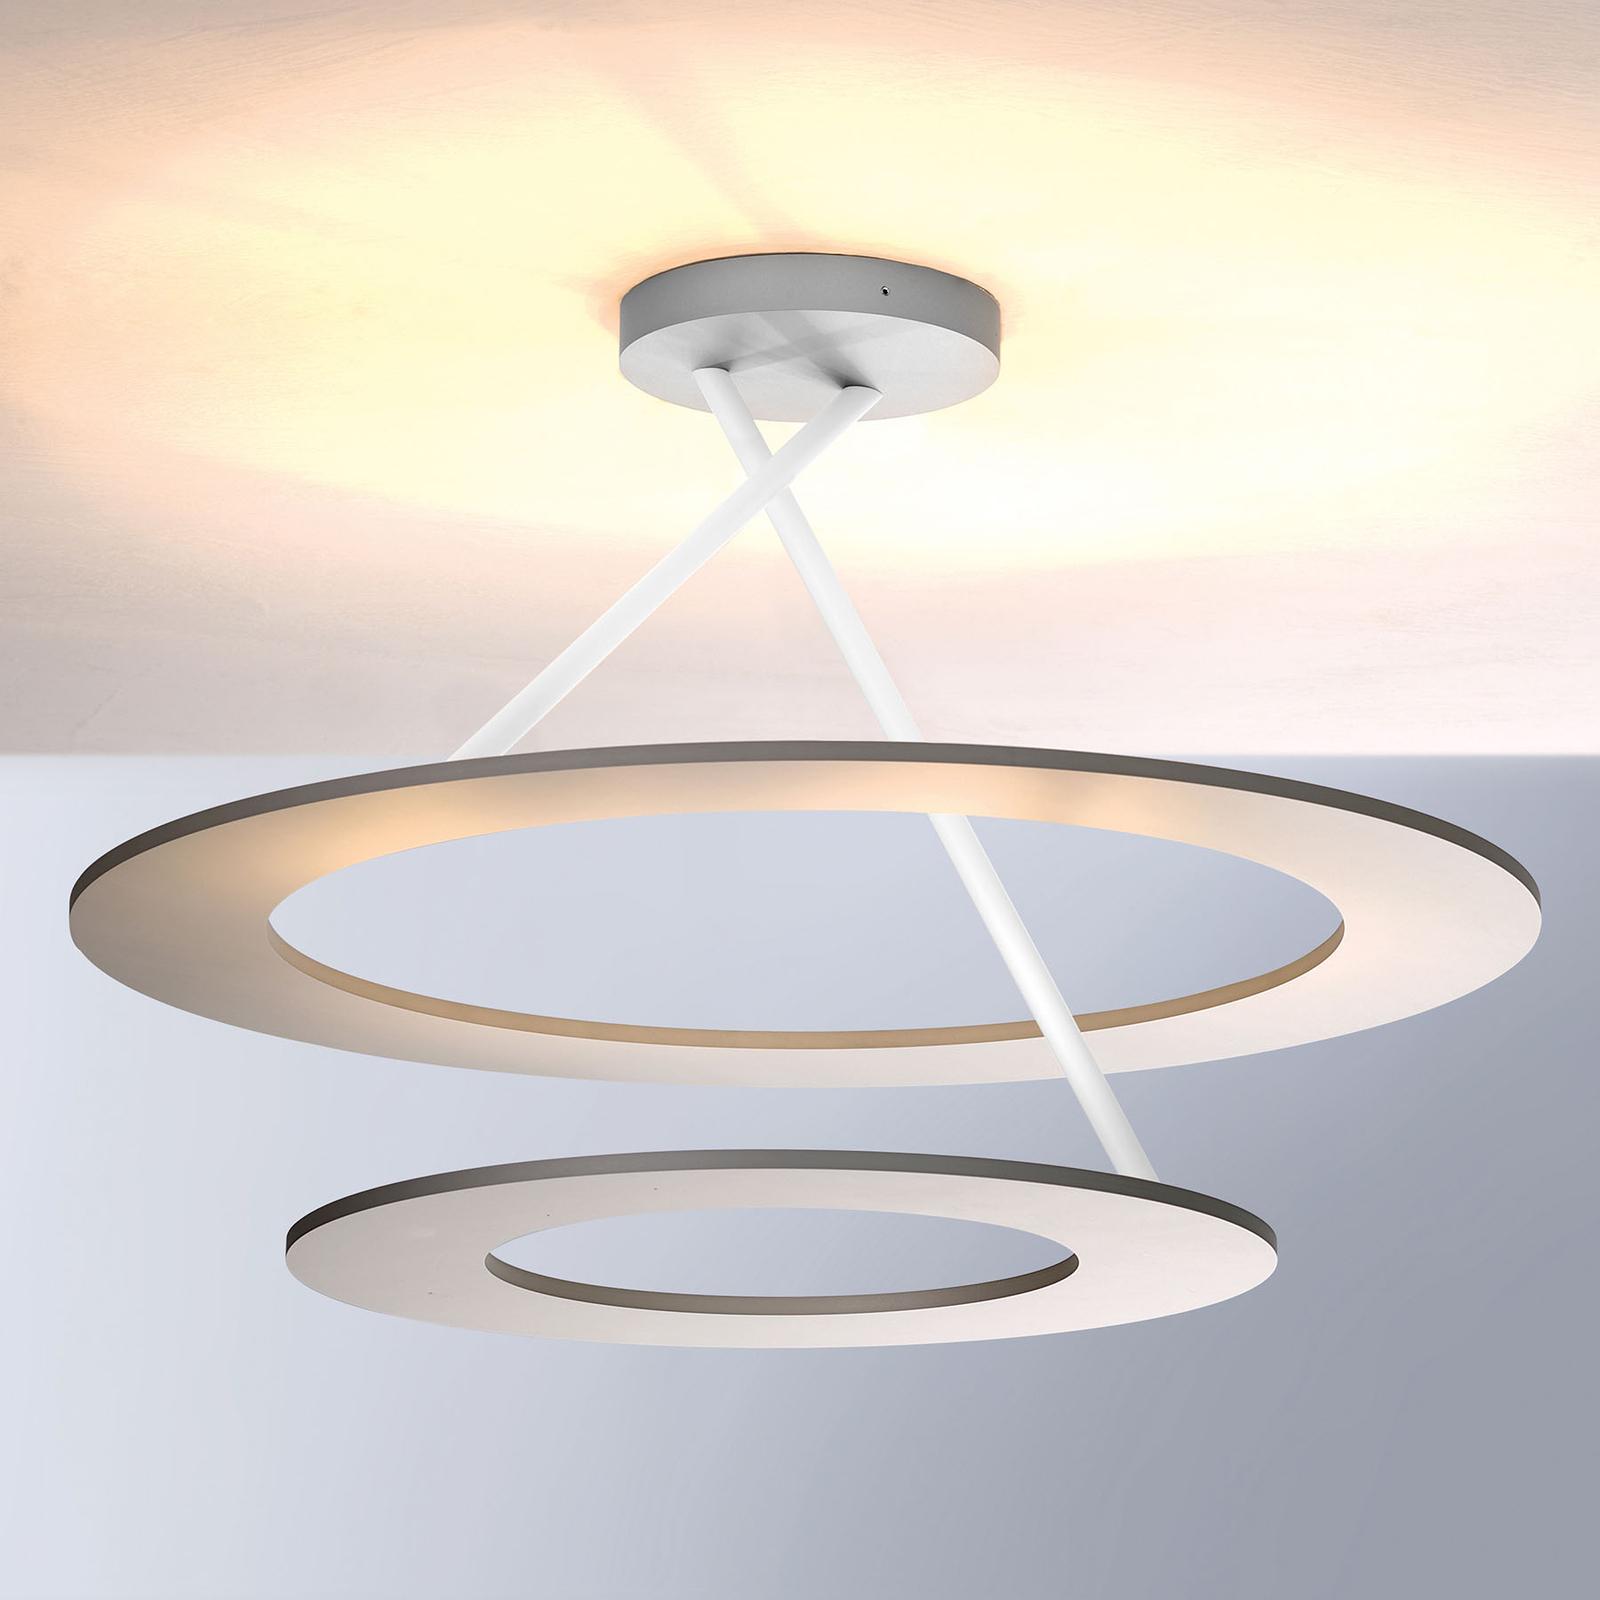 Bopp Stella LED-Deckenlampe 2 Ringe alu/weiß